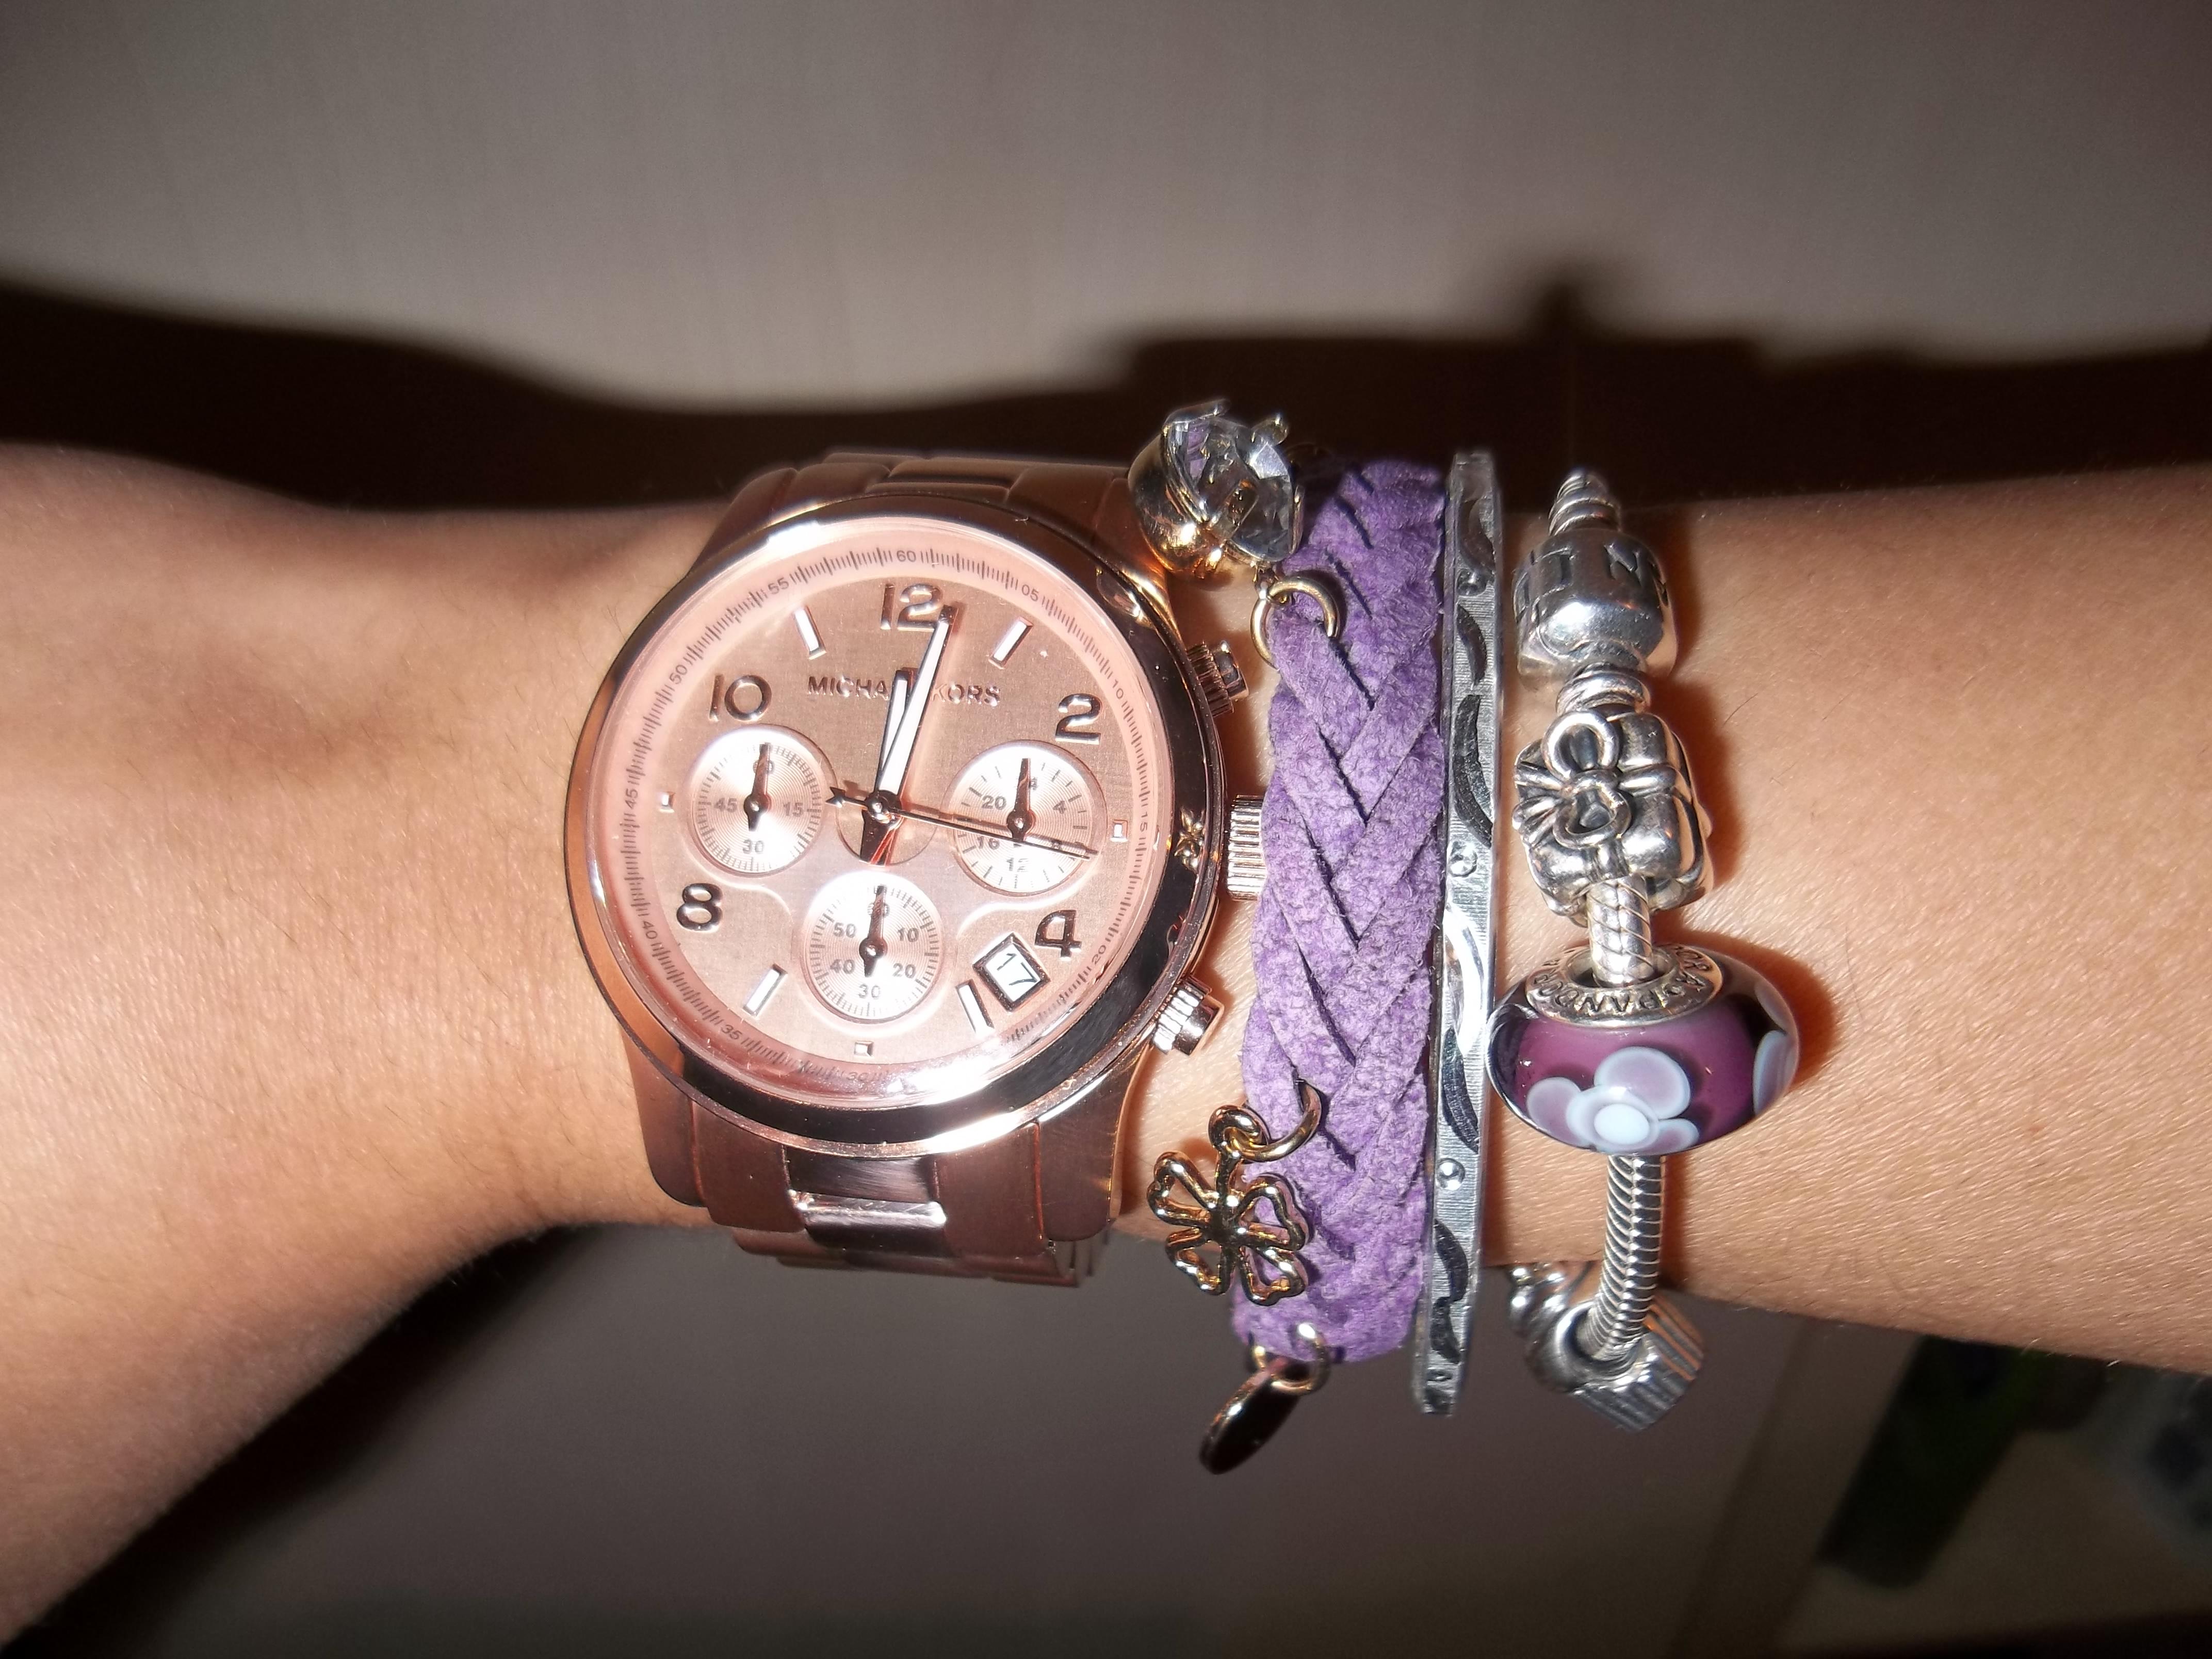 caec3026d0b2 Ladies Michael Kors Runway Chronograph Watch (MK5128)